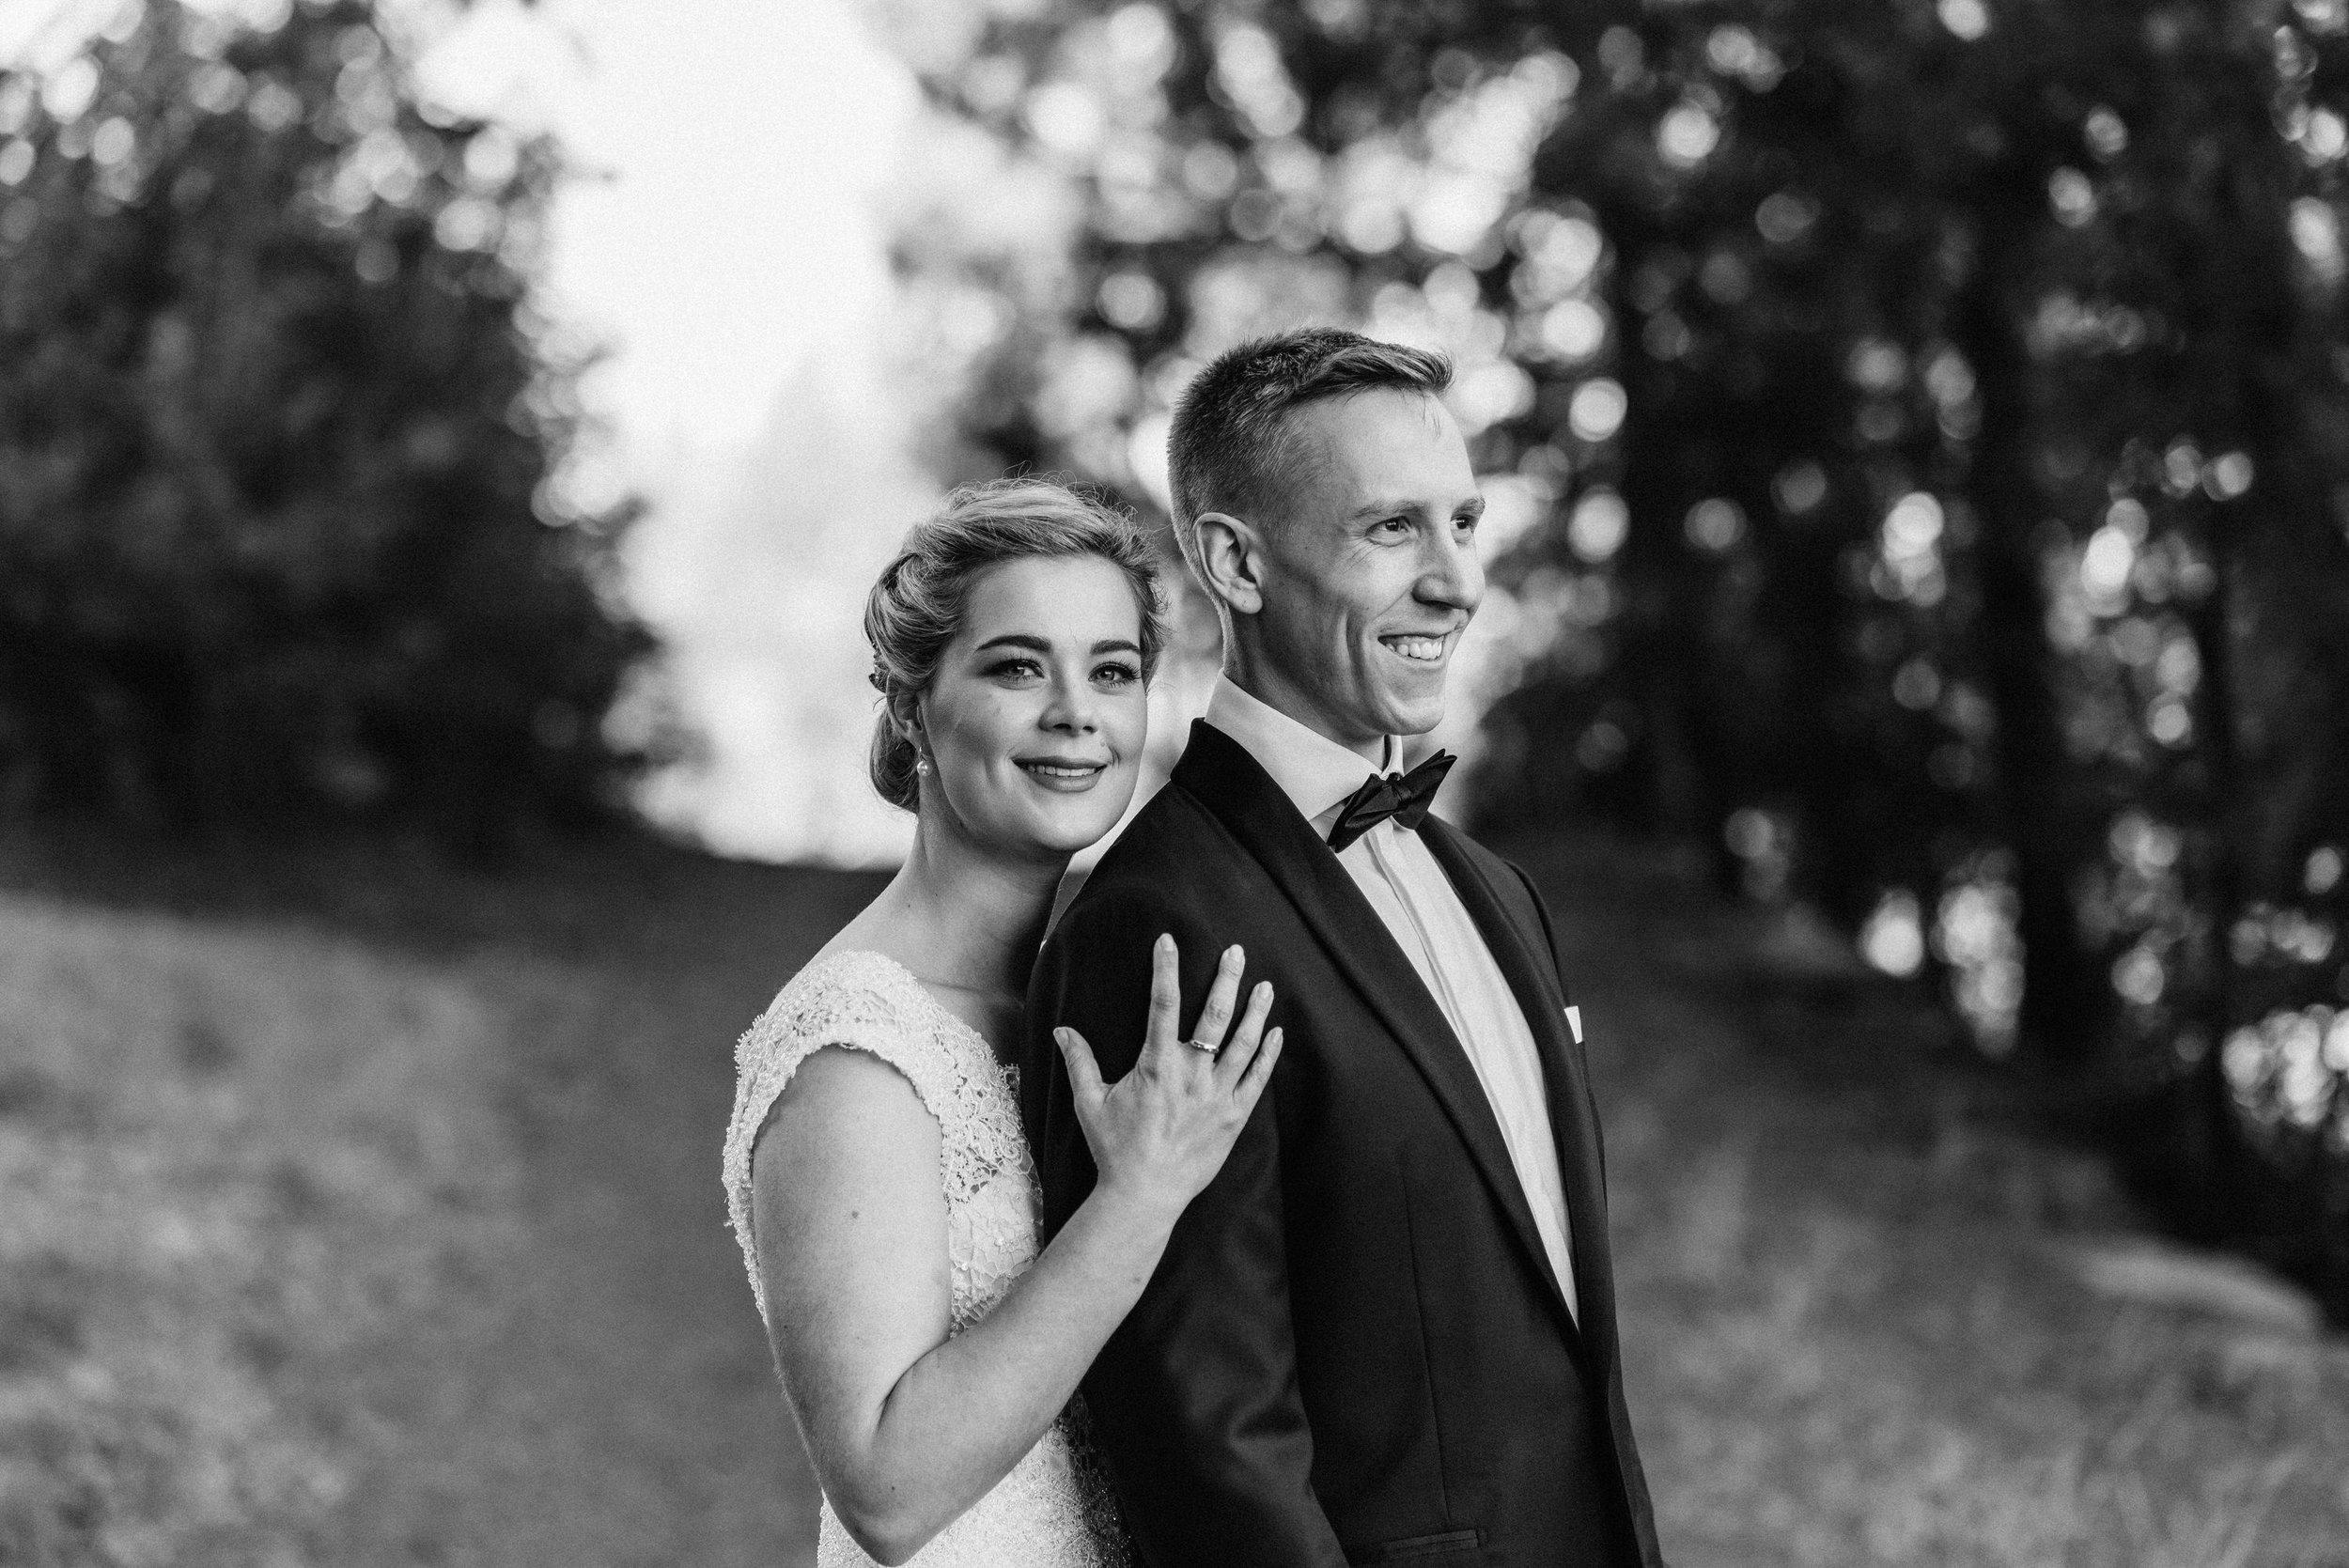 Josef-Chromy-Wedding-58.jpg